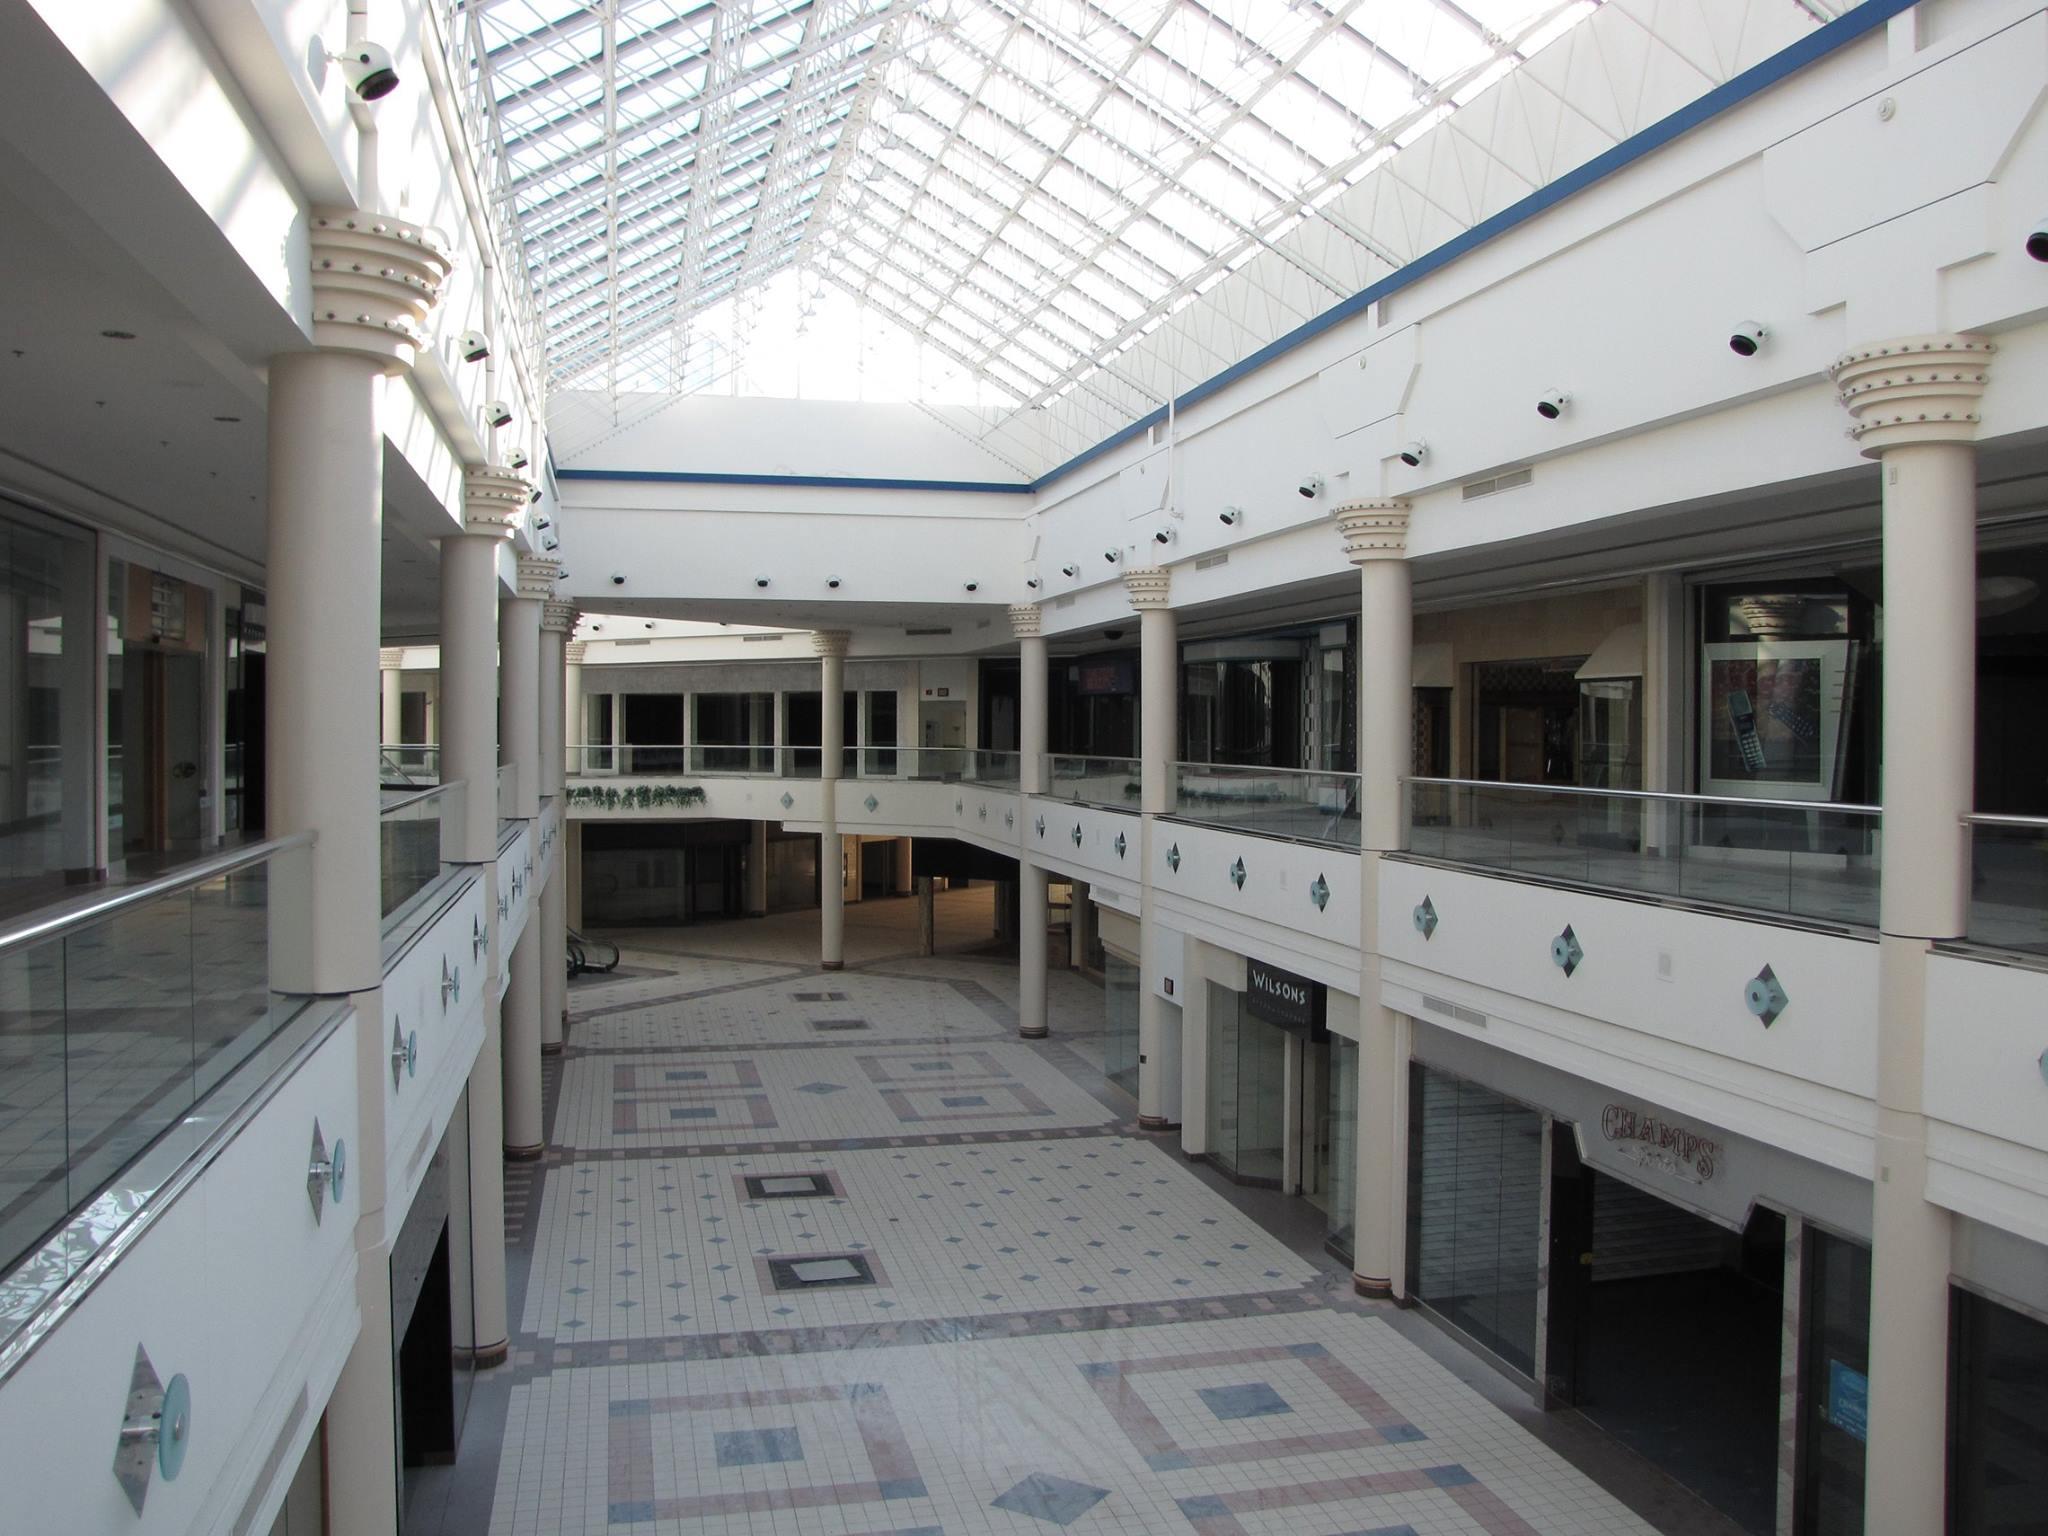 Irondequoit Mall